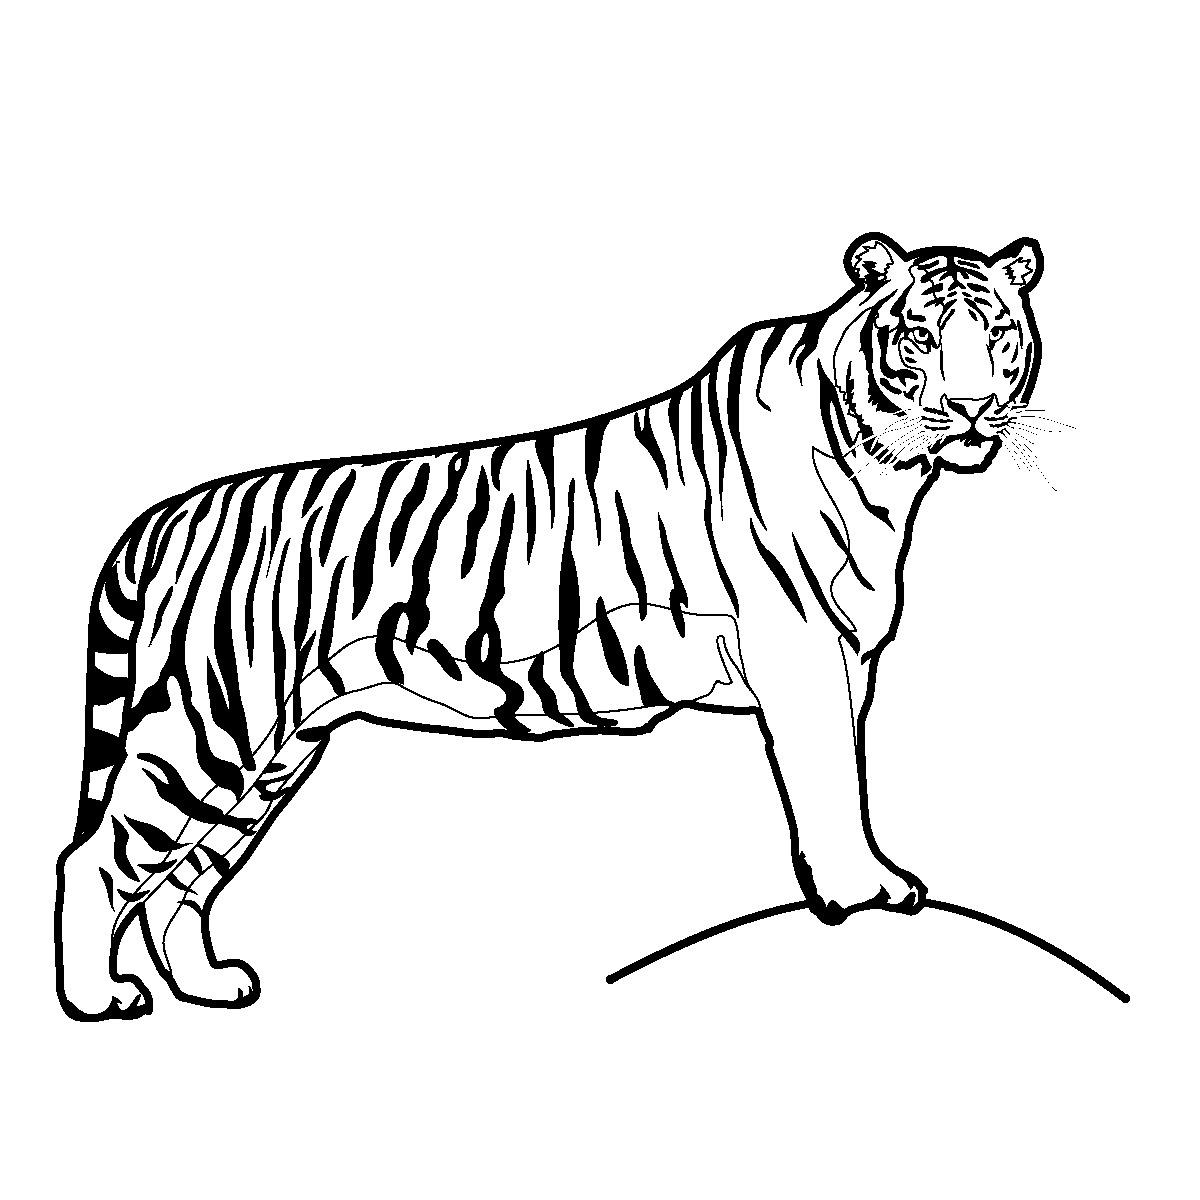 Endangered Animals Clipart | Free download best Endangered Animals ...